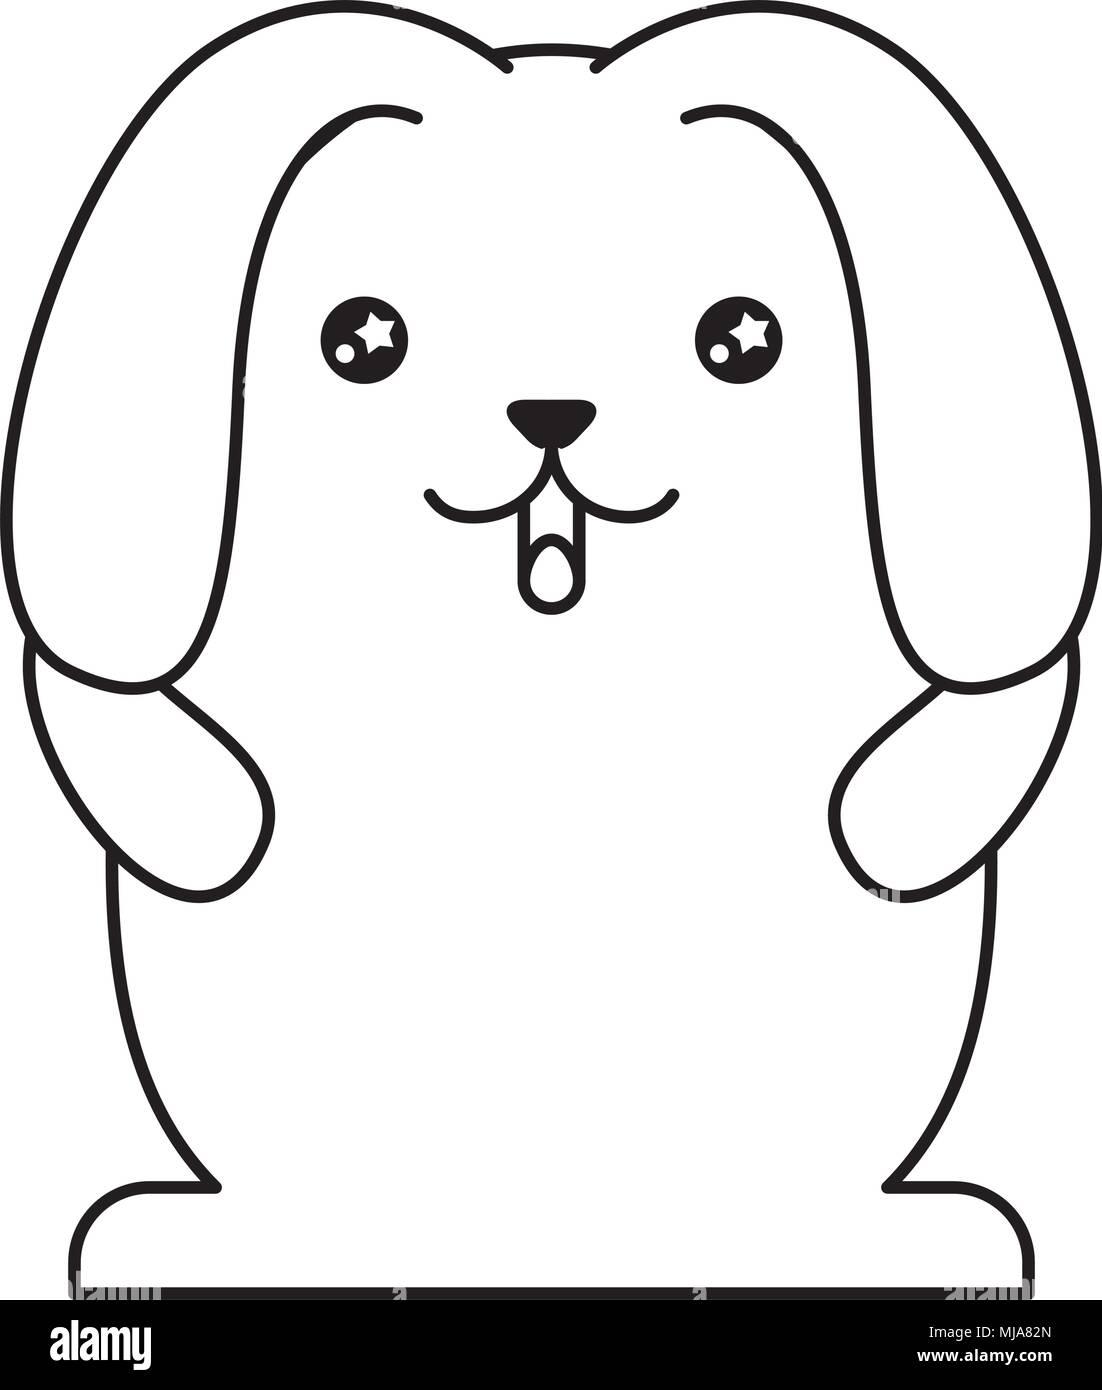 cute rabbit with floppy ears kawaii character vector illustration design - Stock Image